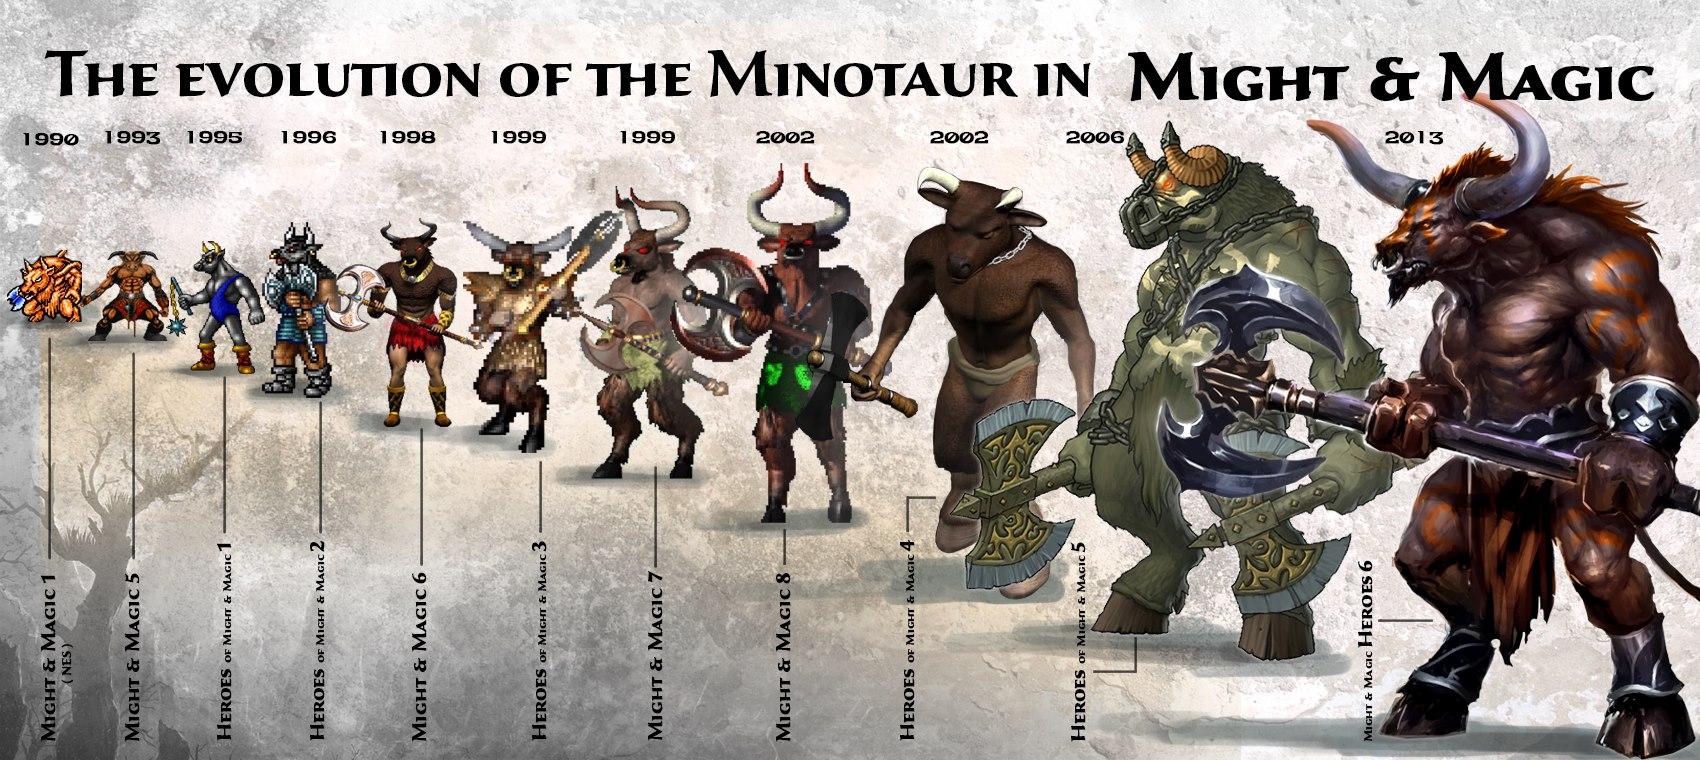 Эволюция Минотавров в Might & Magic